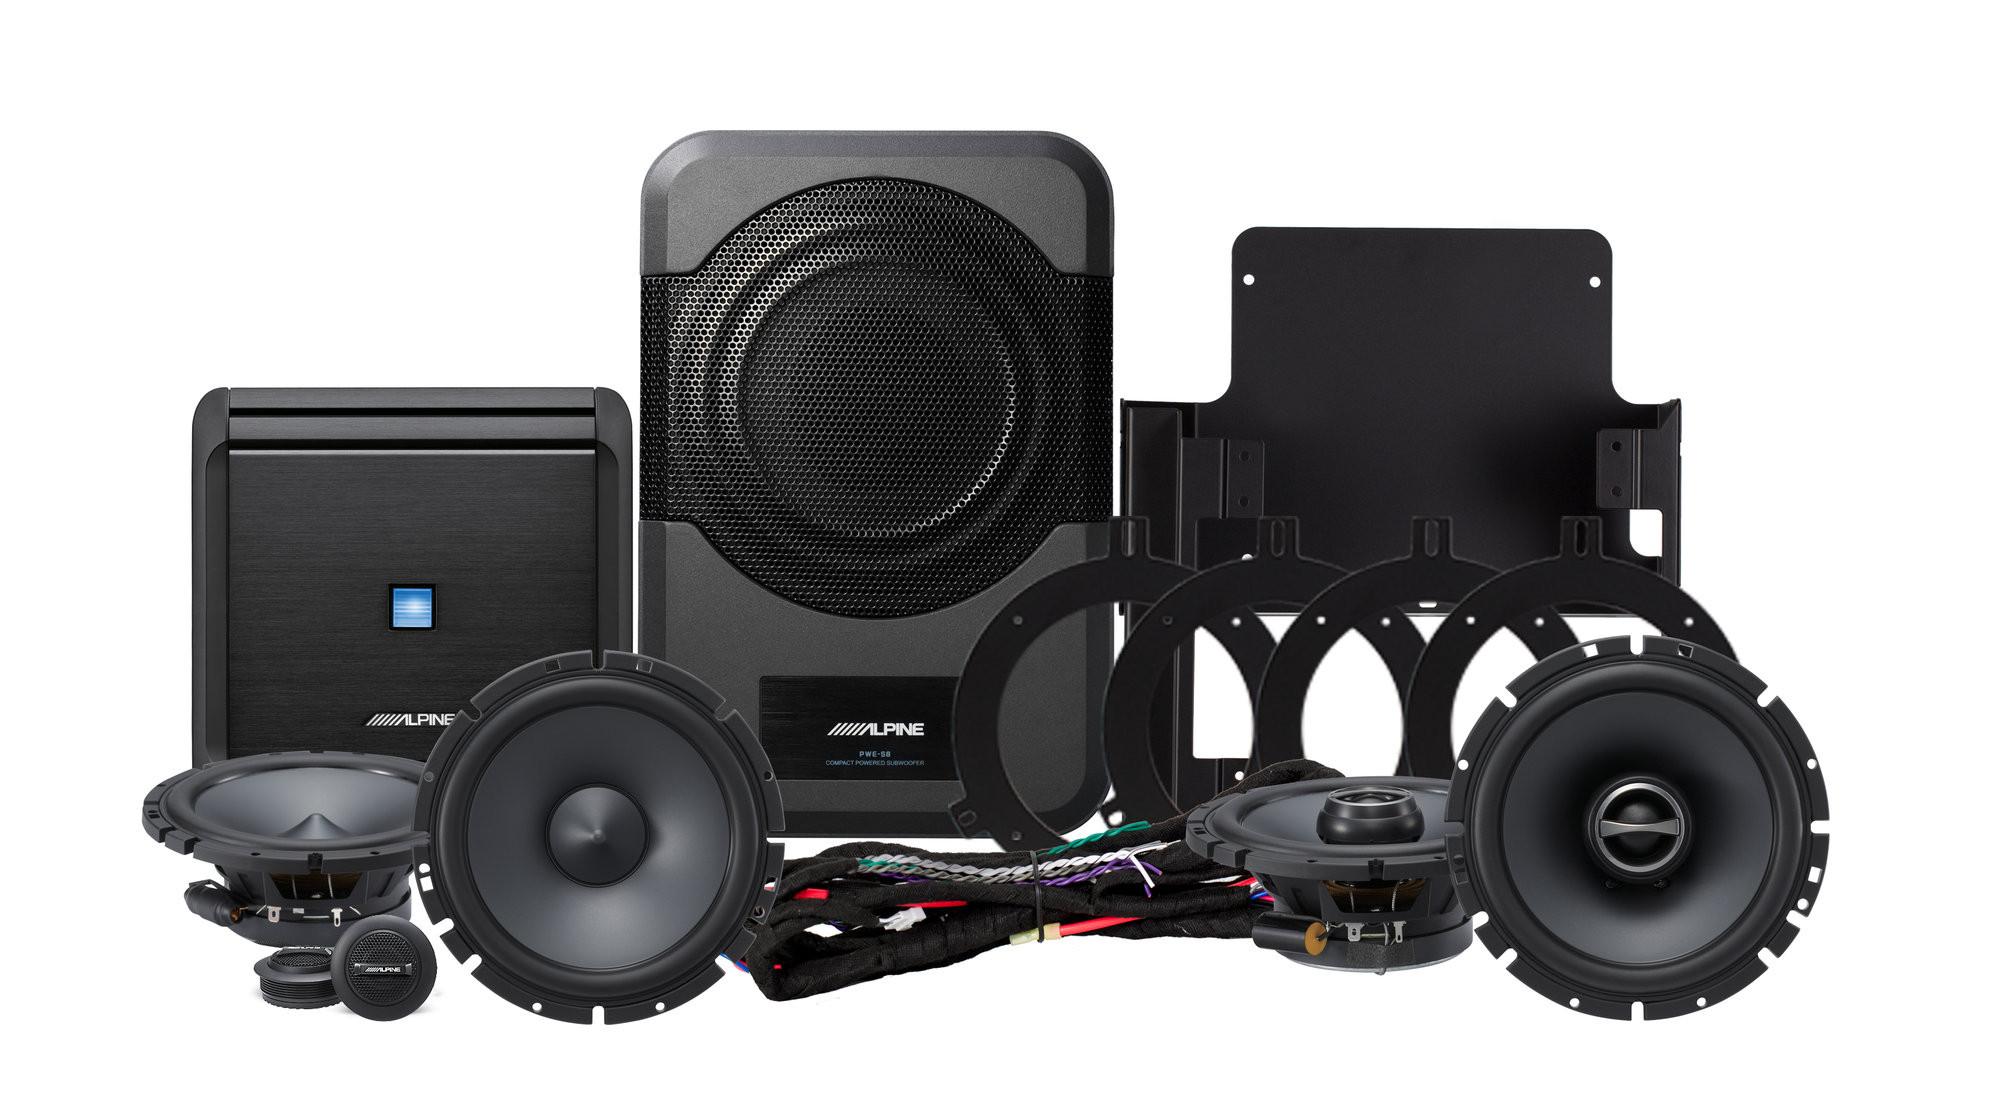 Alpine PSS21WRA Full Sound System Upgrade For 2015-18 Jeep Wrangler JK Unlimited 4 Door Models